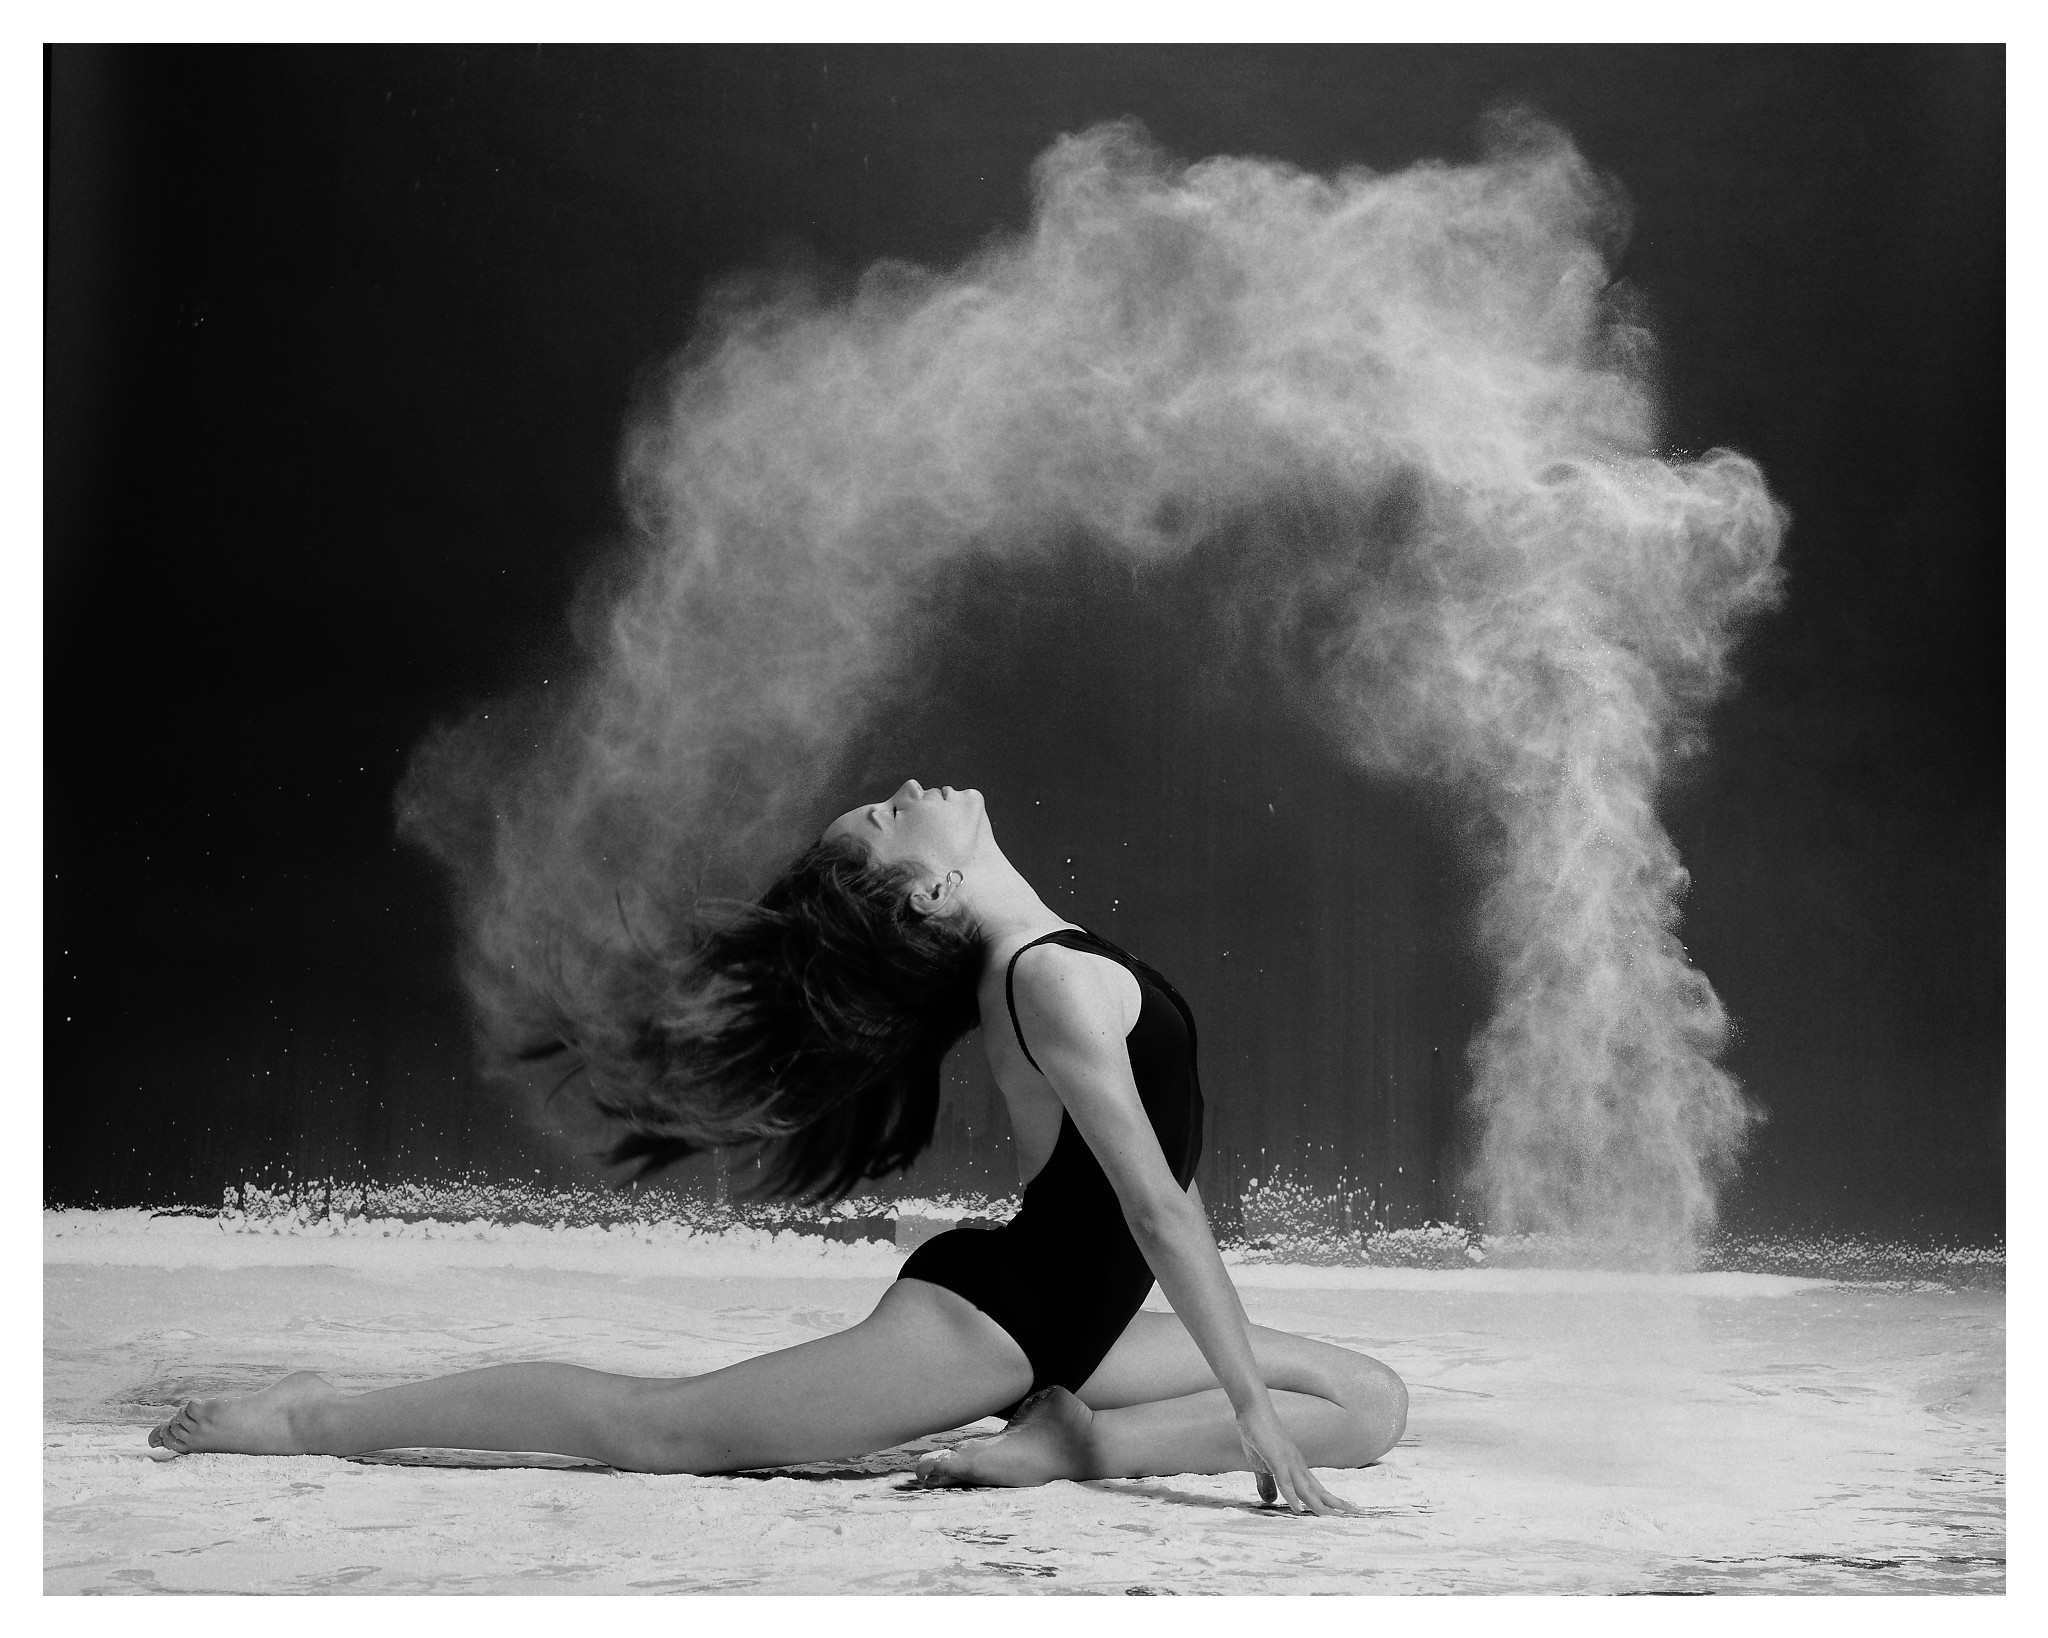 00134_DanceCo-Flour_©2019-The-Lotus-Studios-inc_190820_DxO.jpg